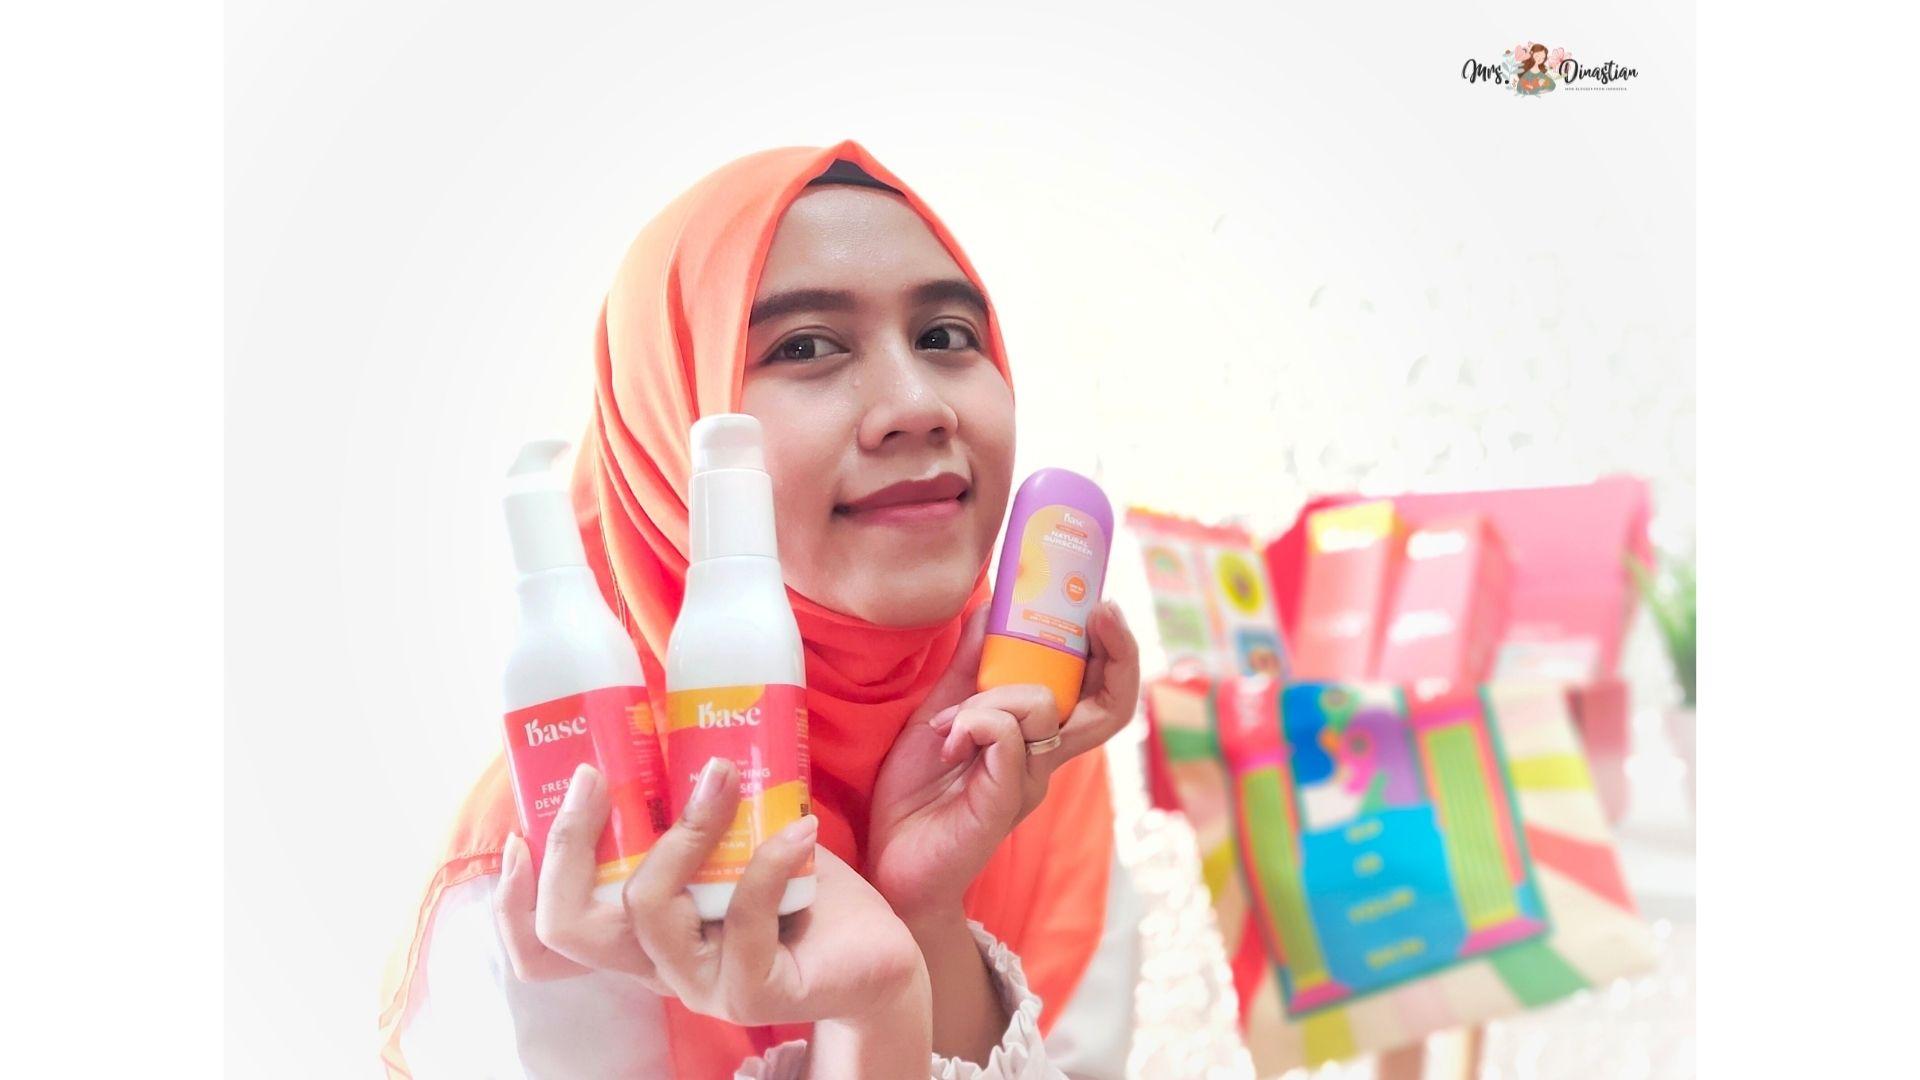 Base Skincare